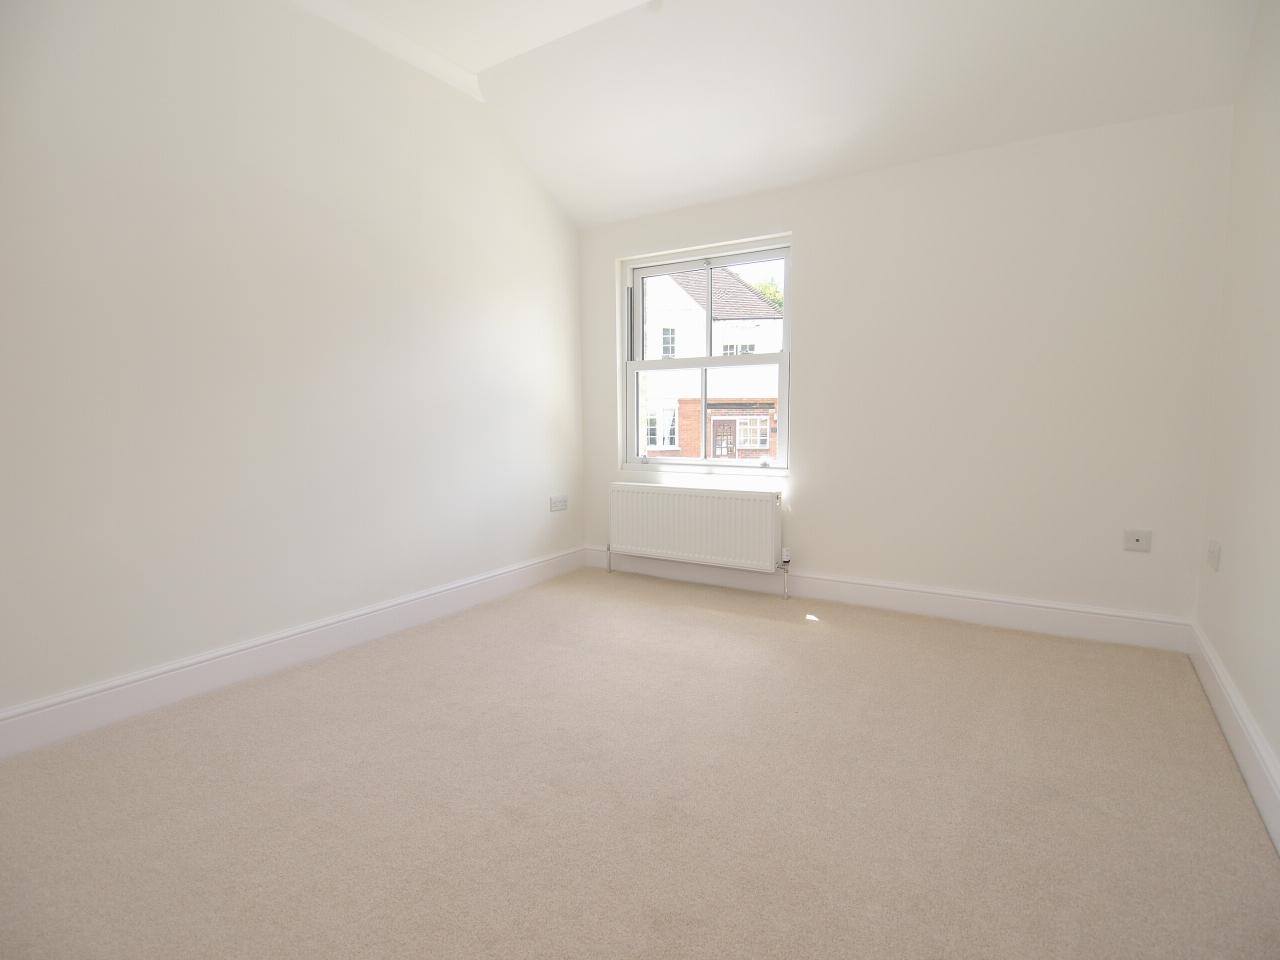 2 bedroom mid terraced house Sold in Sevenoaks - Photograph 9